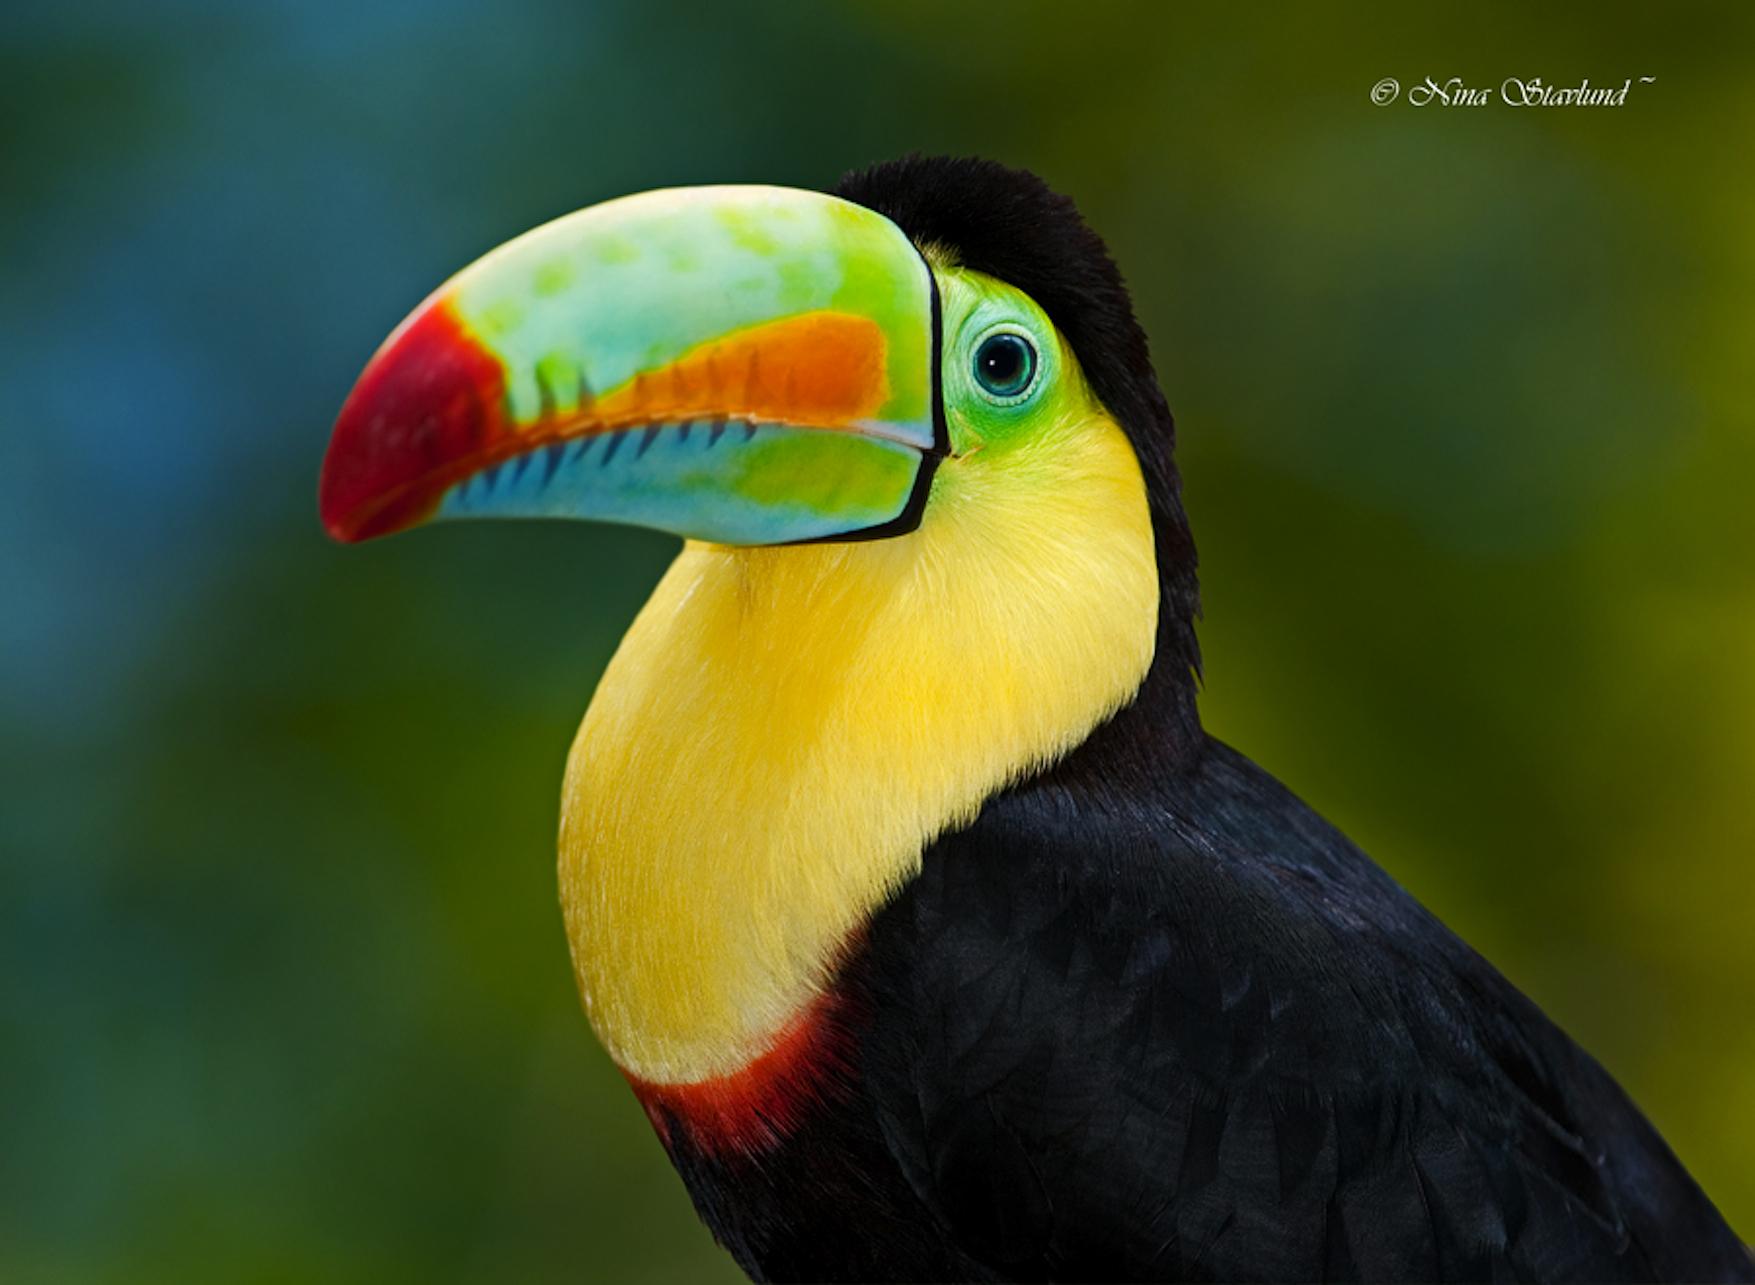 Nina-Stavlund-keel-billed-toucan